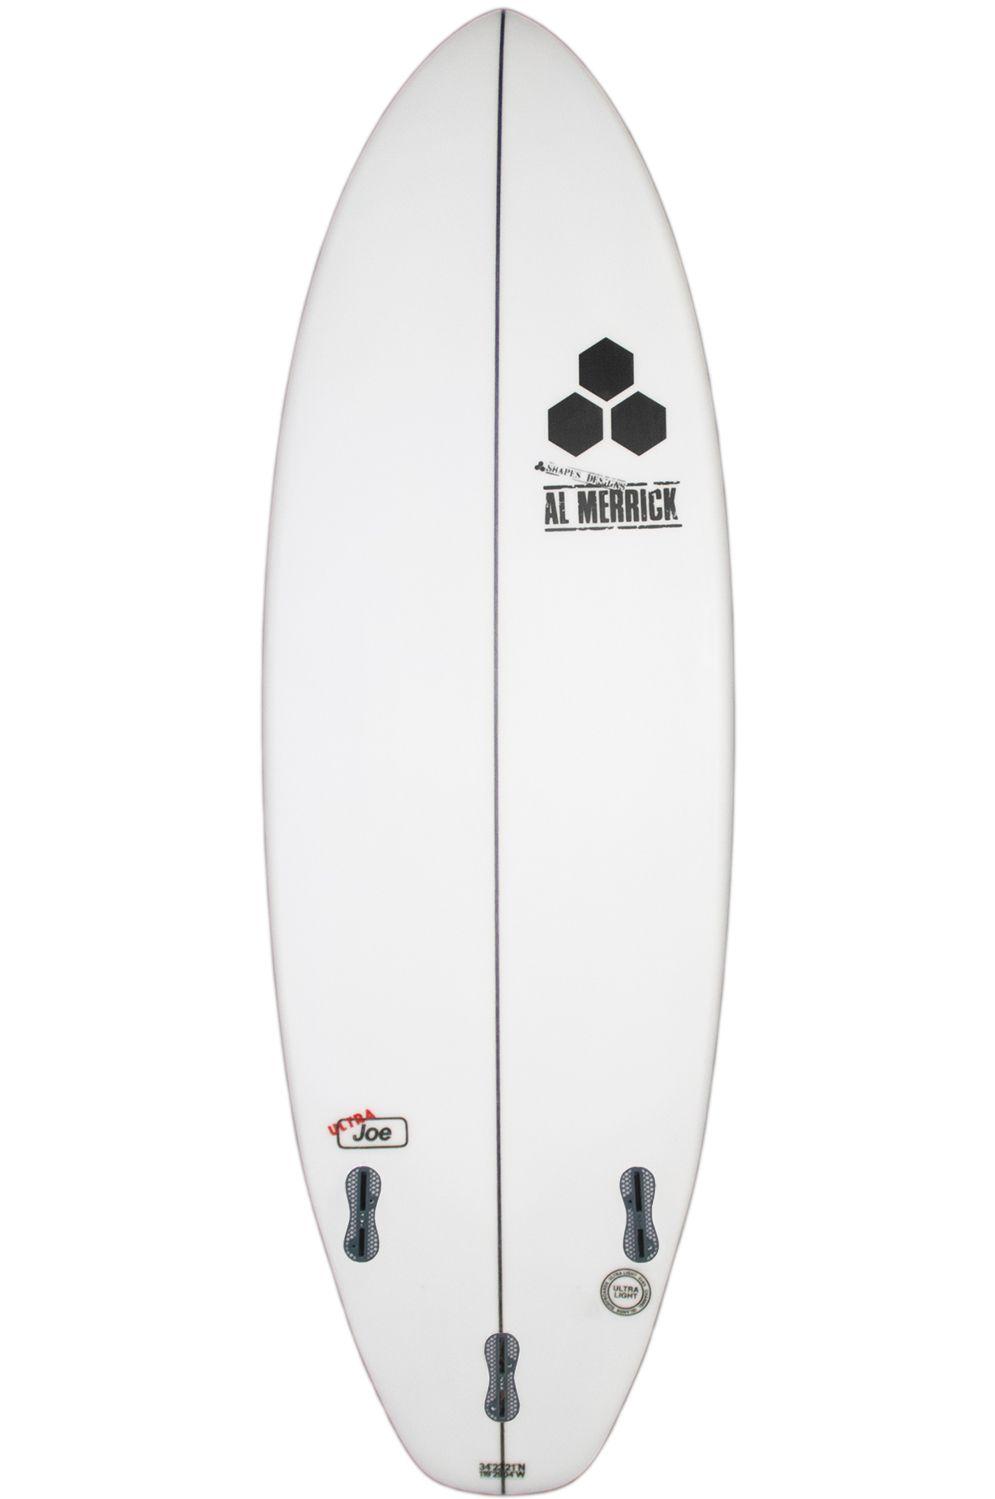 Prancha Surf Al Merrick ULTRA JOE 6'0 Squash Tail - White FCS II 6ft0